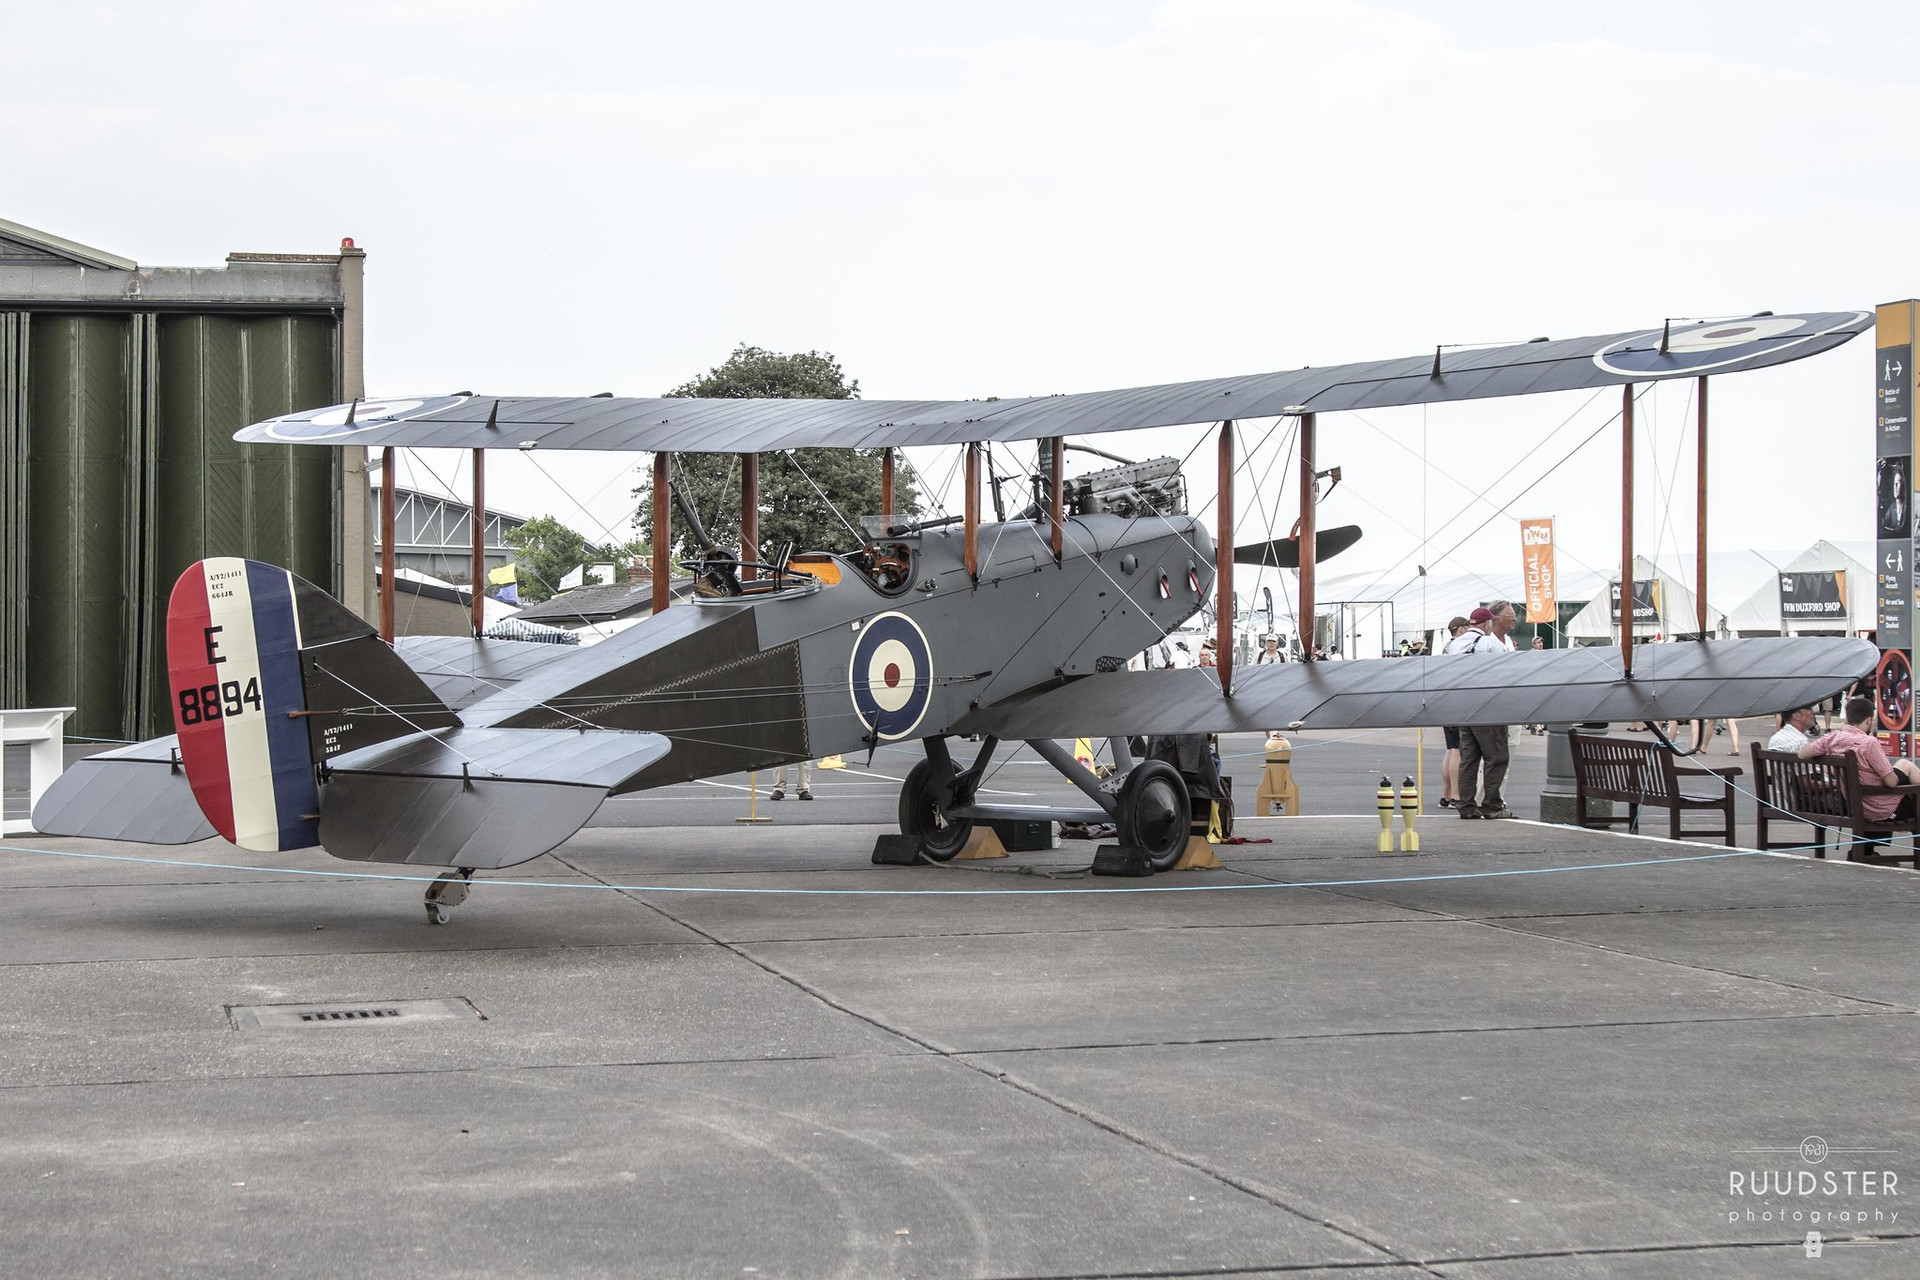 G-CDLI   Build: 1918 - De Havilland DH-9